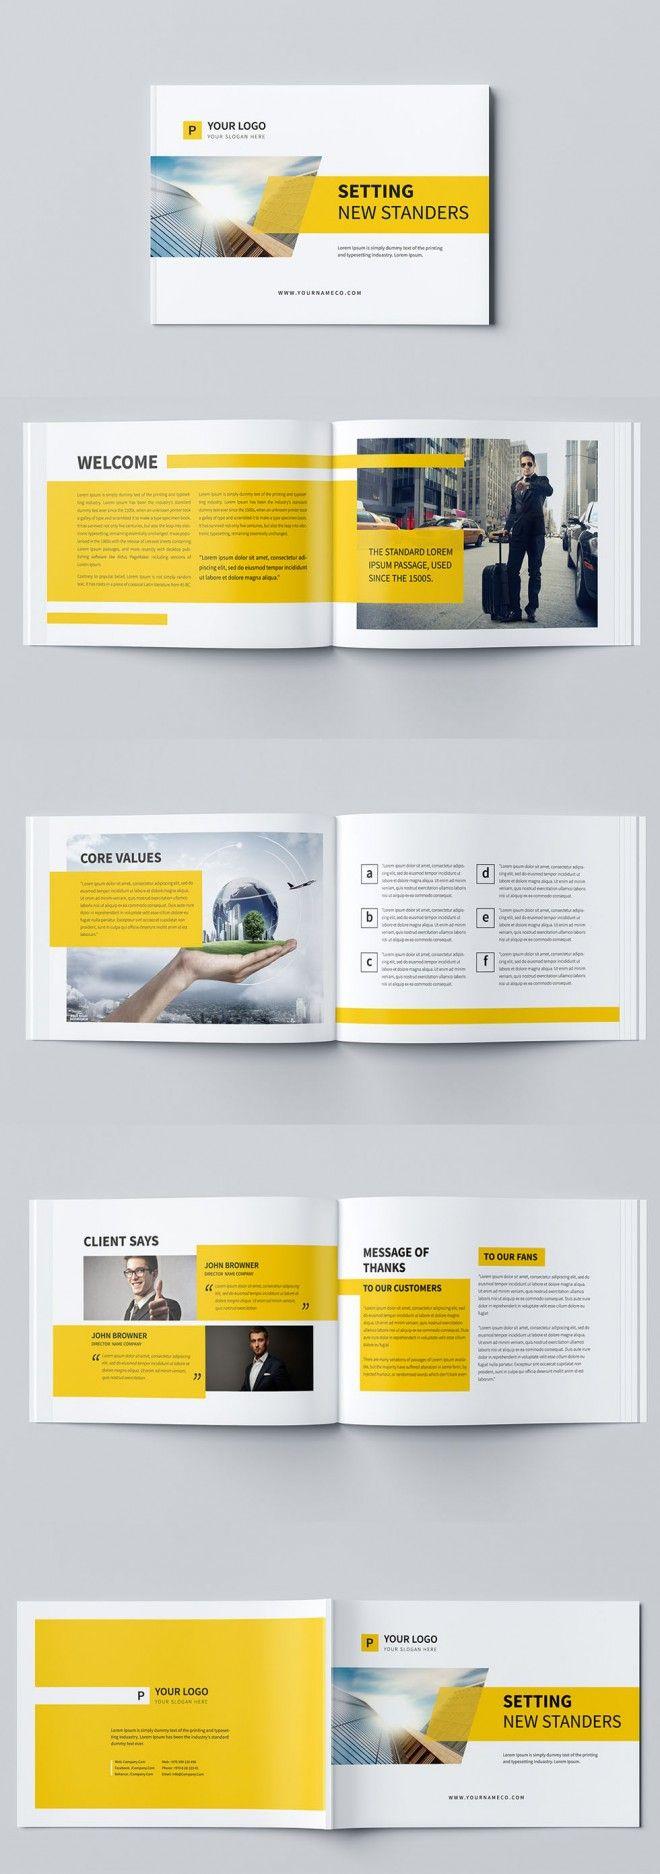 Best-brochure-templates-8 October Newsletter Sample Template on free downloadable preschool, printable downloadable,